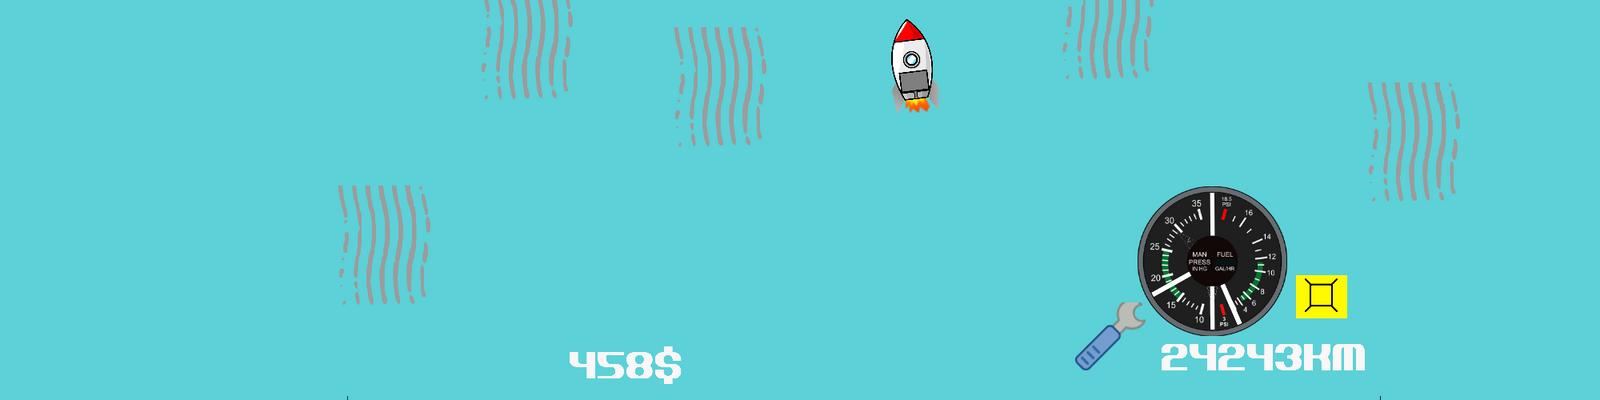 470981-tnmzfu6z-v4.png